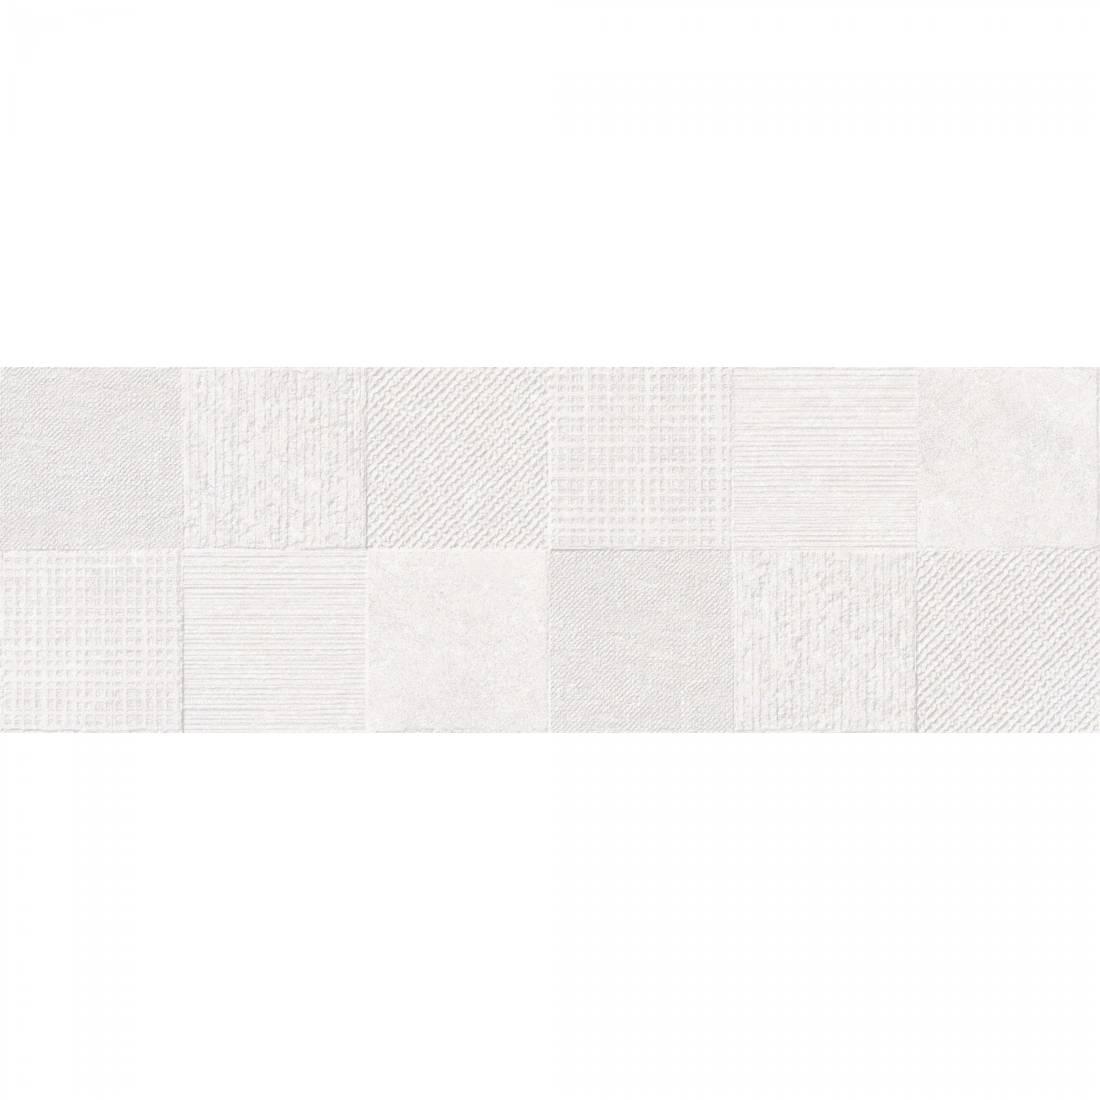 Olite Liebanna Decor 20x60 Blanco Matt 1